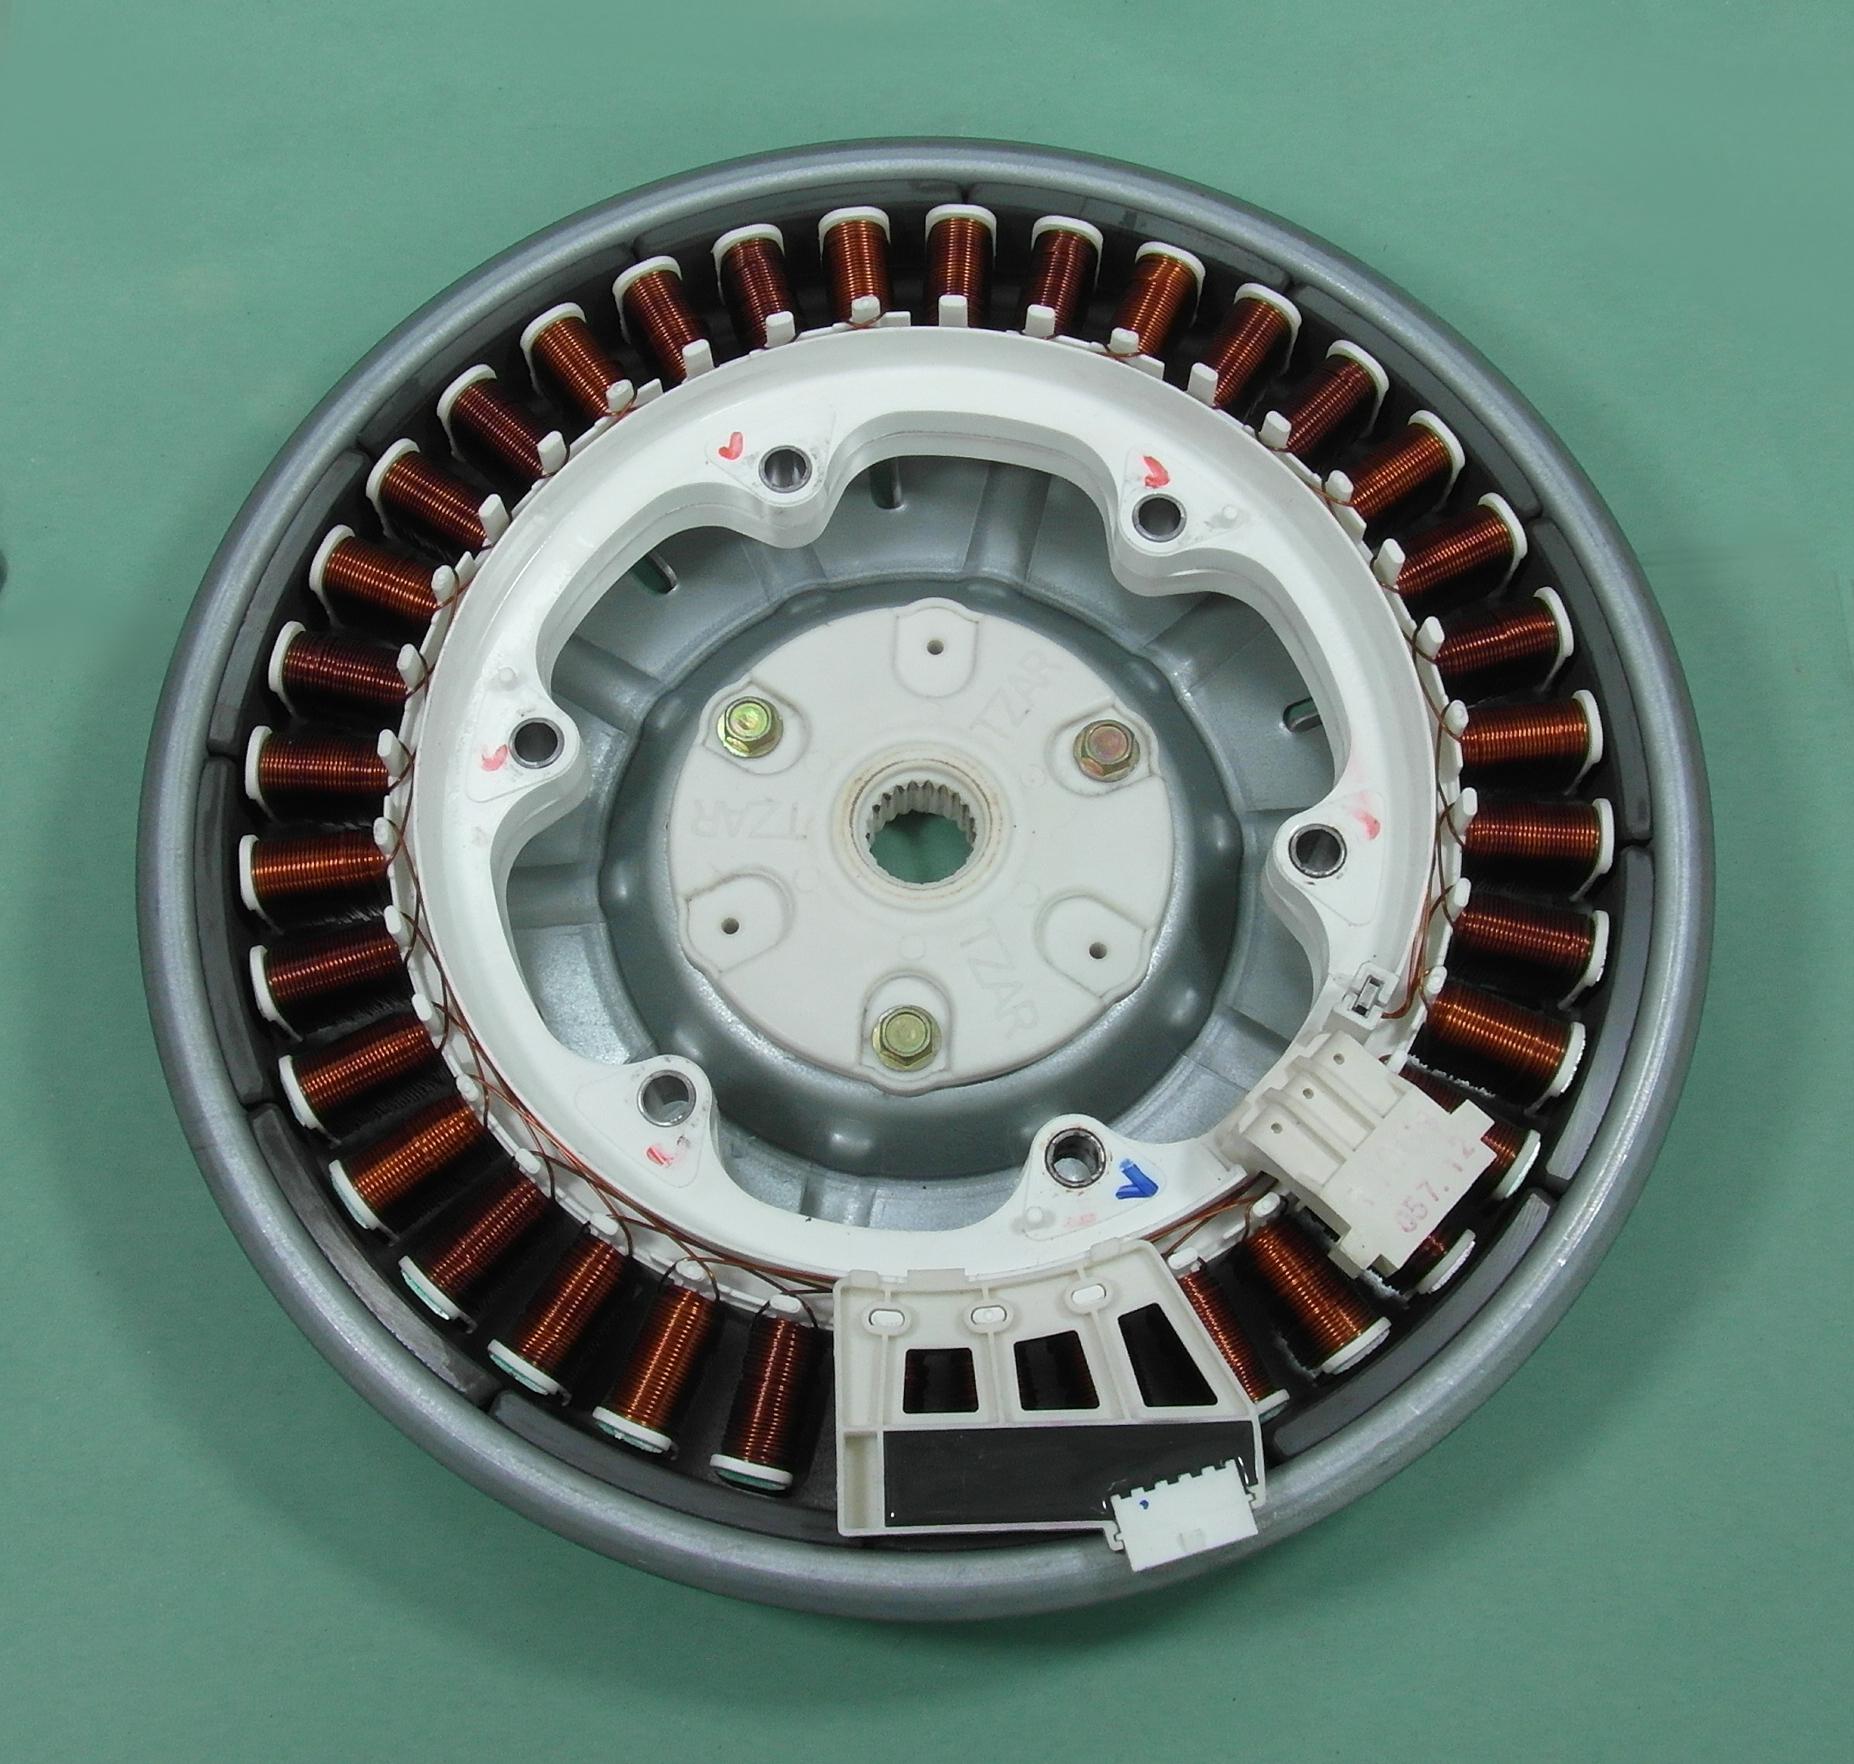 Lg wm 12392td washing machine direct drive rotor stator for Direct drive motor washing machine